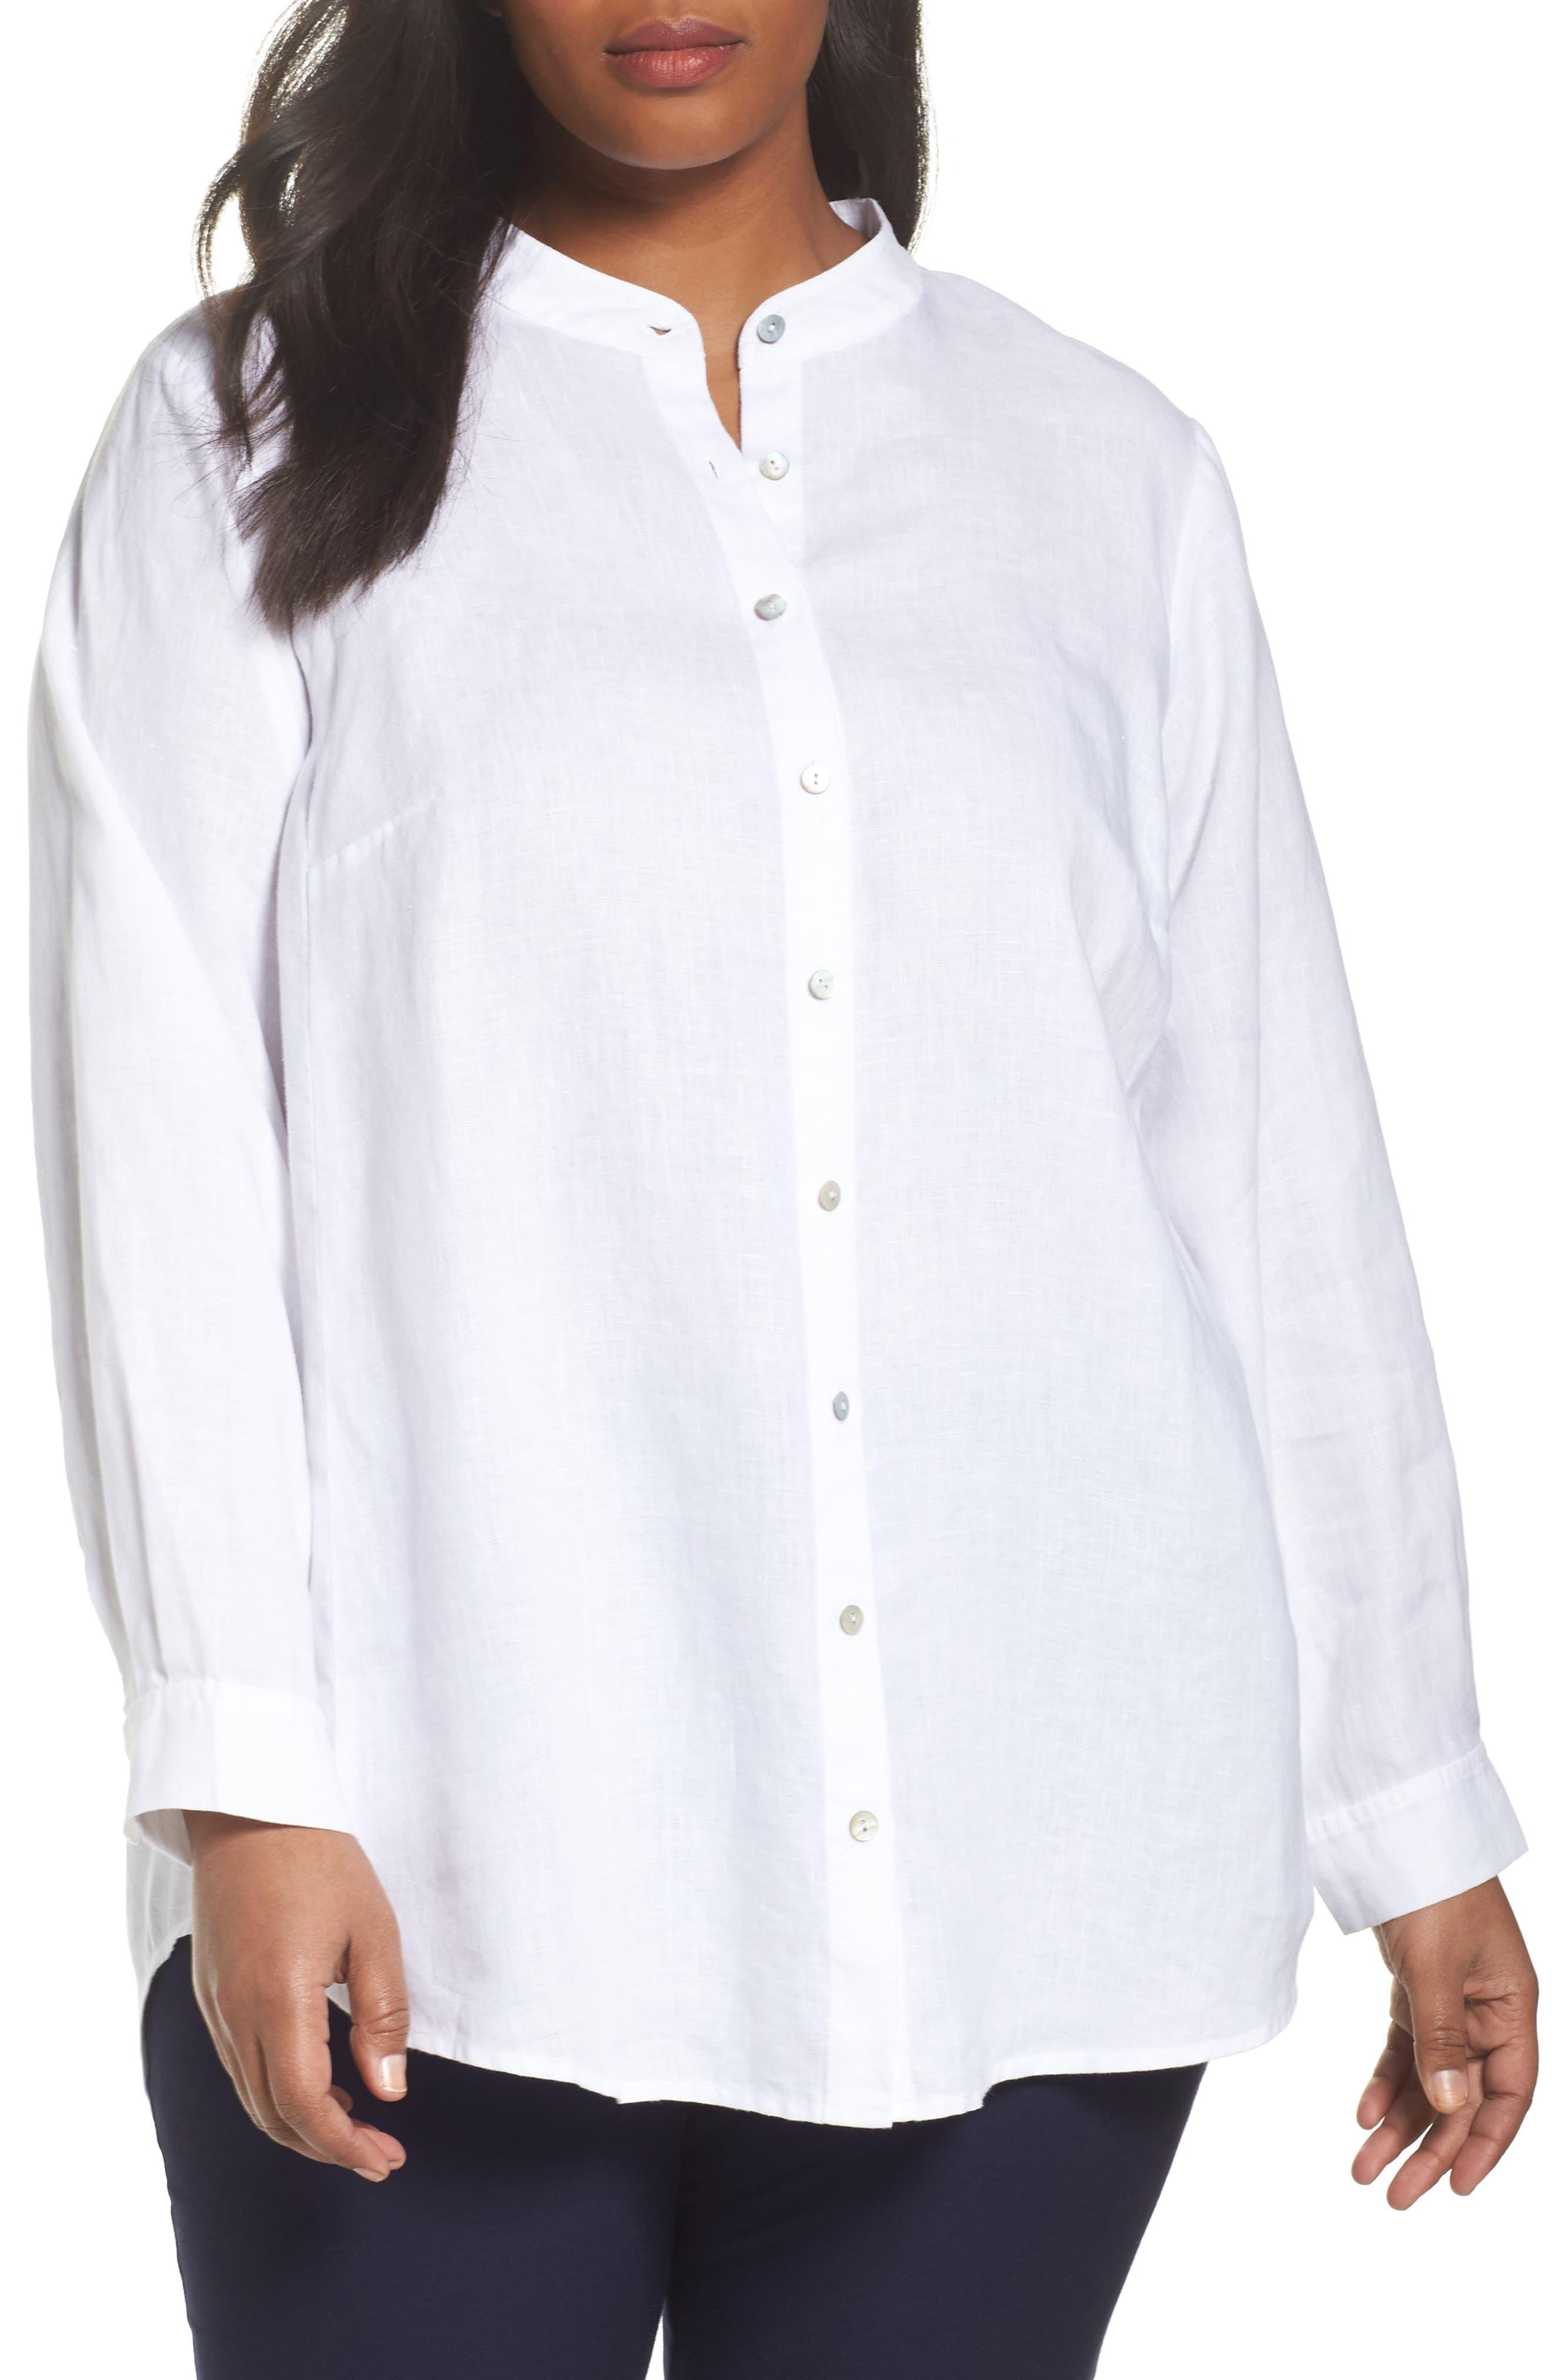 Alternate Image 1 Selected - Eileen Fisher Organic Linen Tunic Shirt (Plus Size)